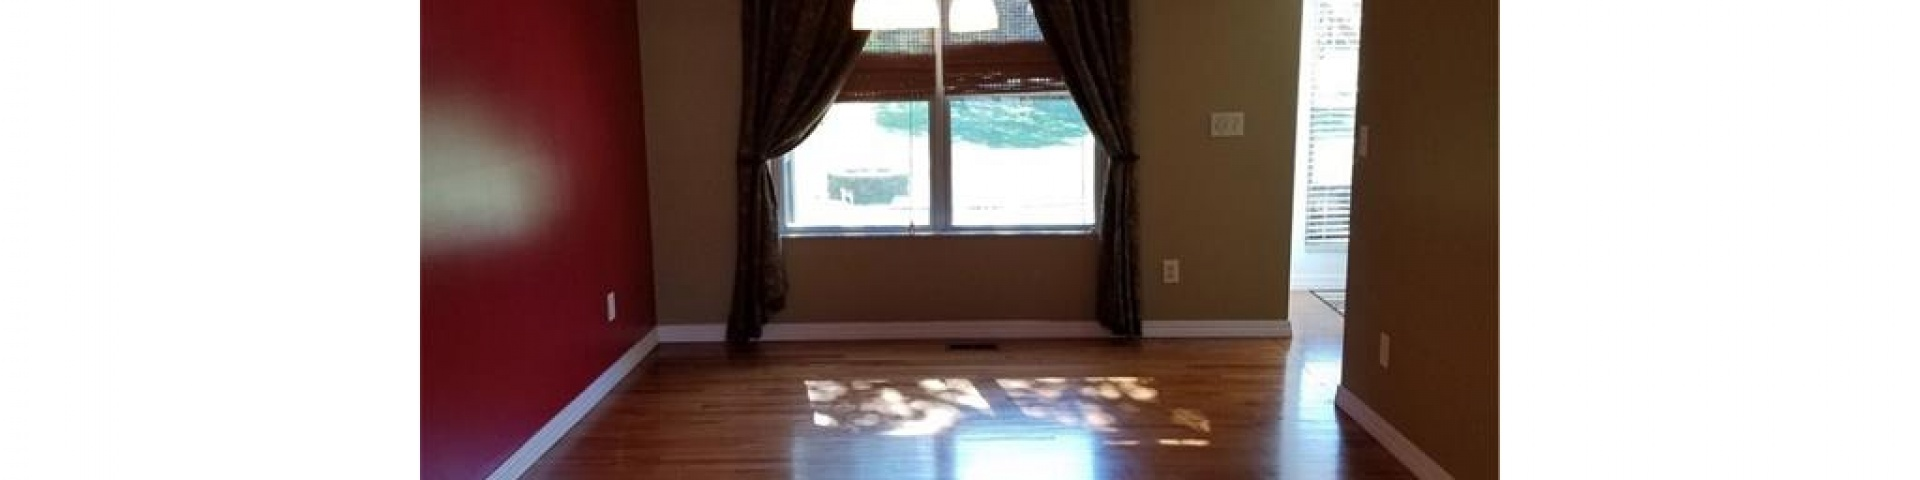 1432 Great Hunter,Grove City,Ohio 43123,3 Bedrooms Bedrooms,11 Rooms Rooms,2 BathroomsBathrooms,Single family,Great Hunter,735185